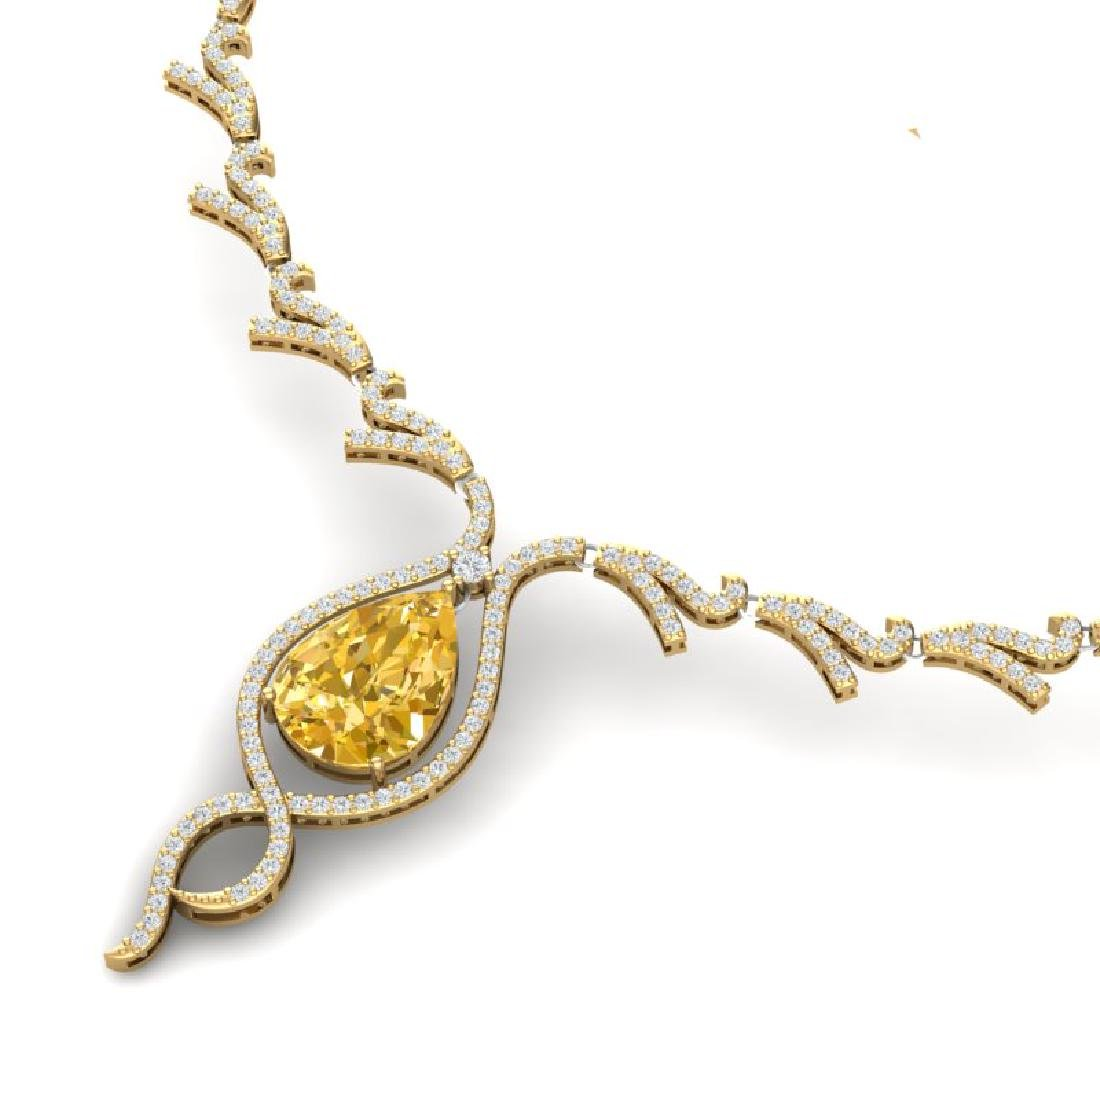 23.02 CTW Royalty Canary Citrine & VS Diamond Necklace - 2